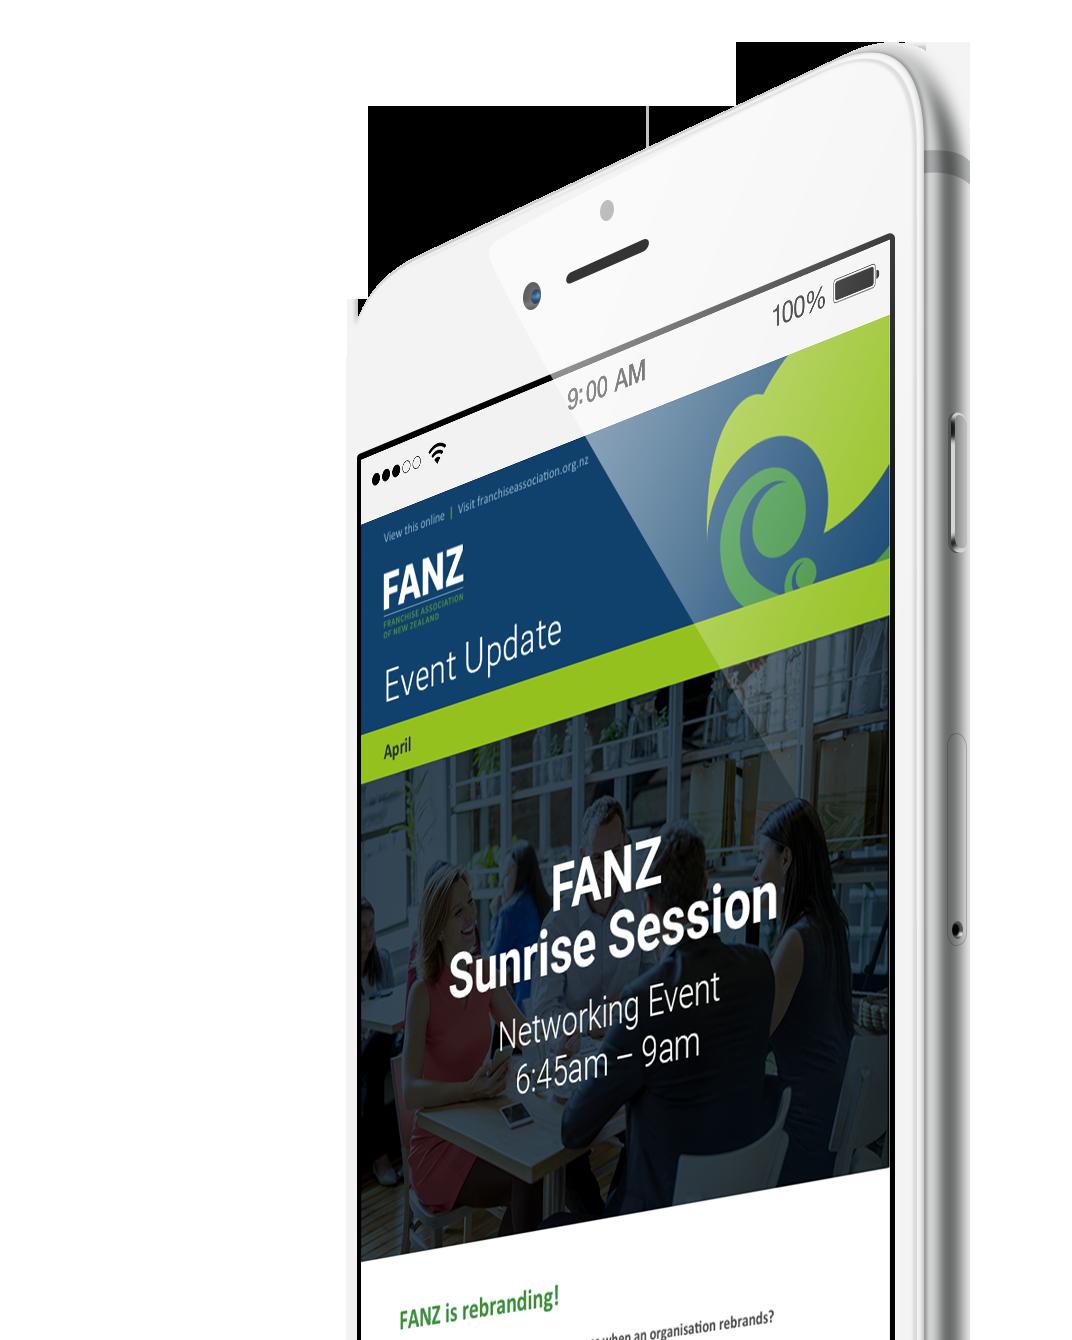 FANZ-News-iPhone-6-Mockup